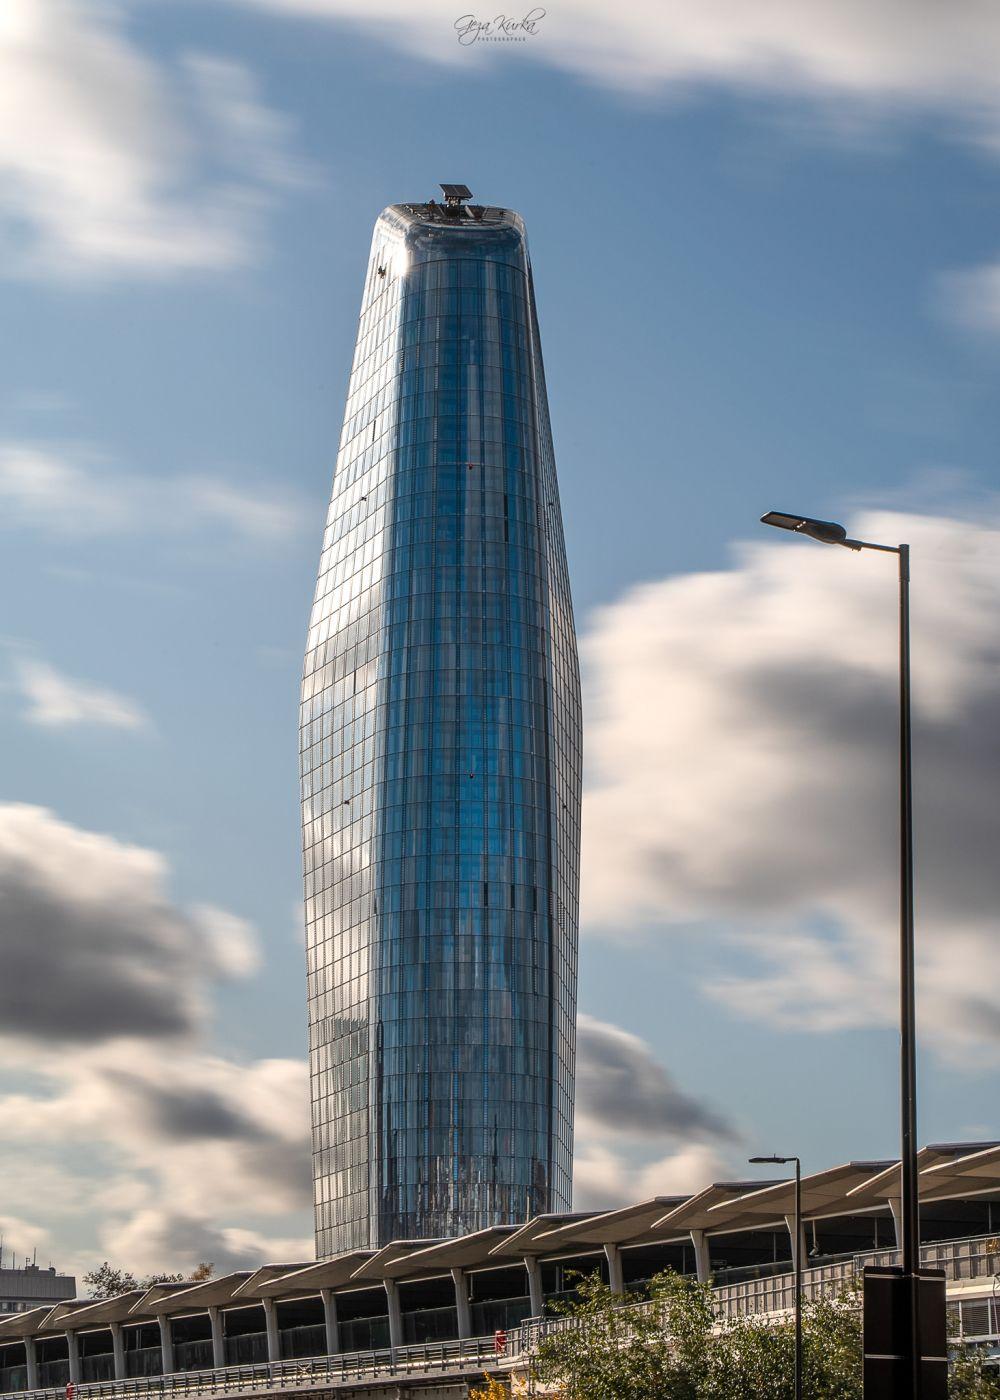 The One Blackfriars skyscraper in London City, United Kingdom